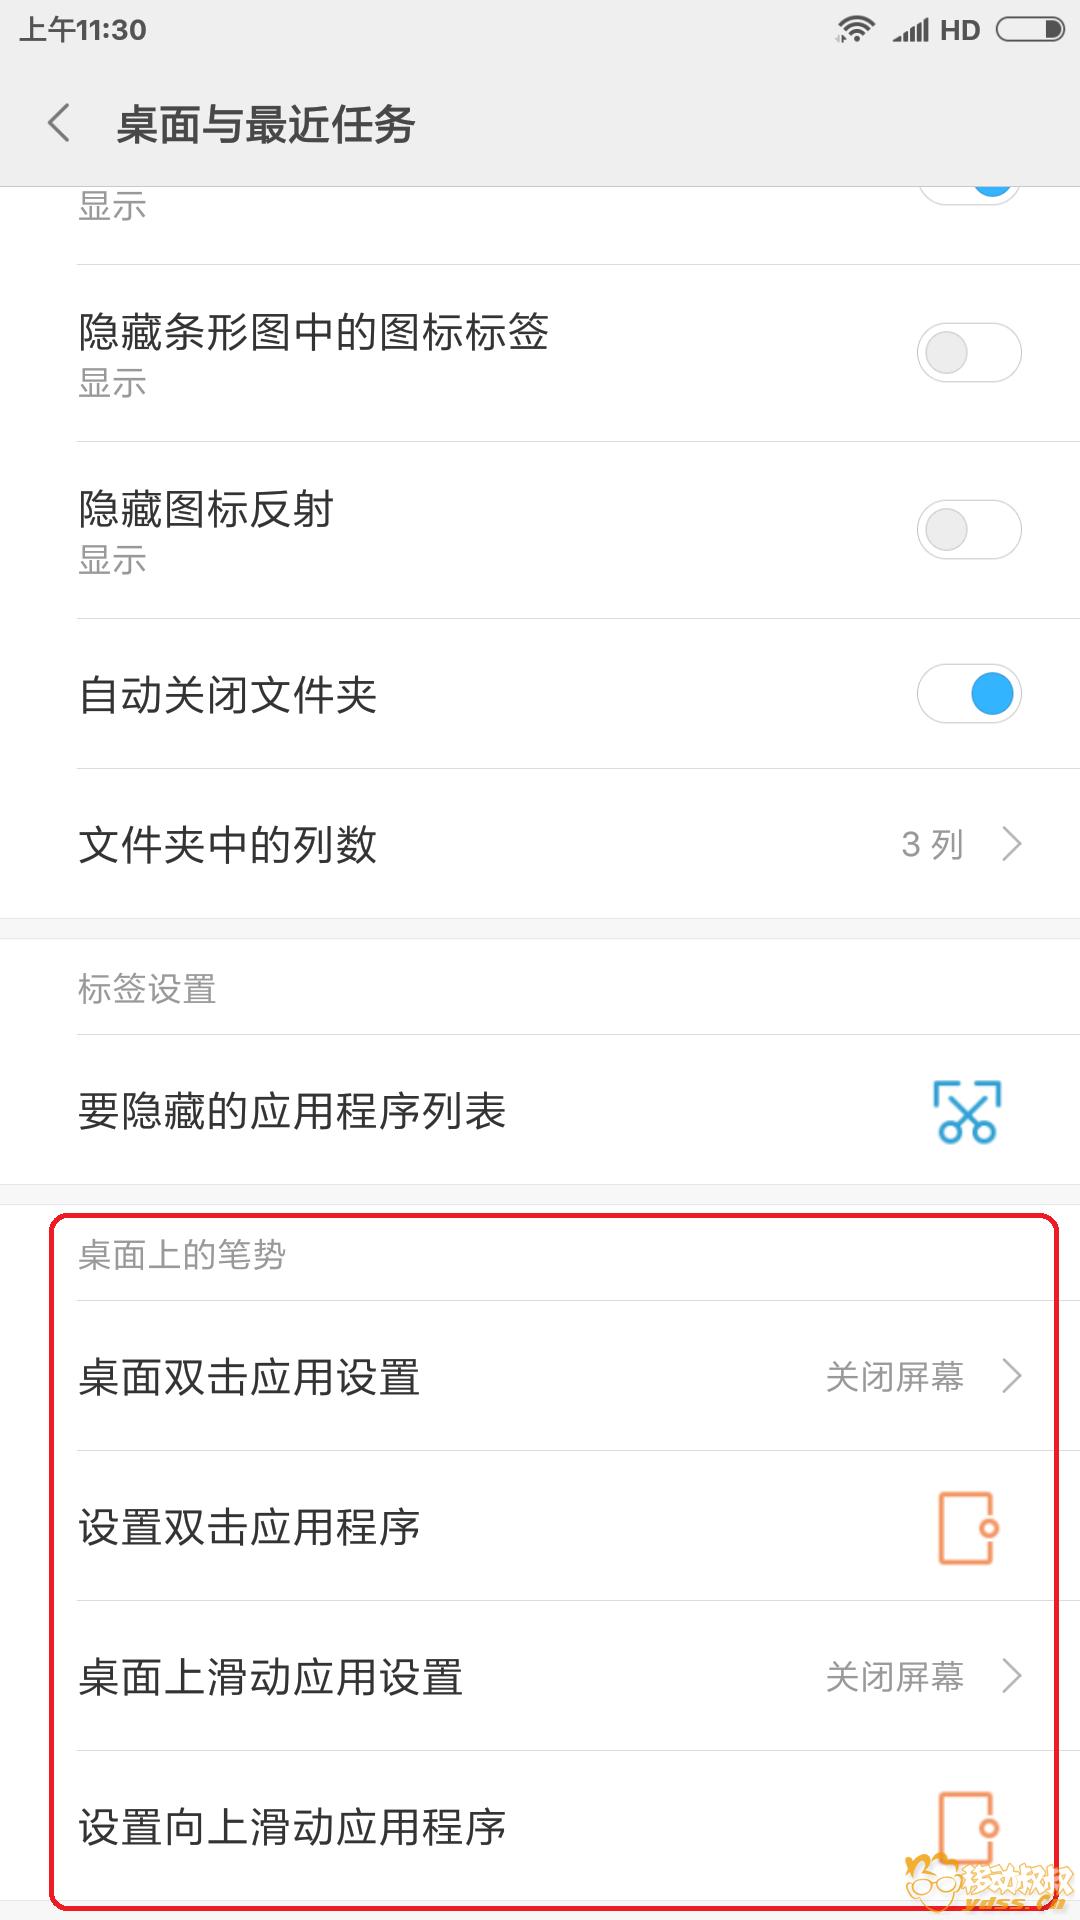 Screenshot_2018-05-04-11-30-45-760_com.android.settings.png